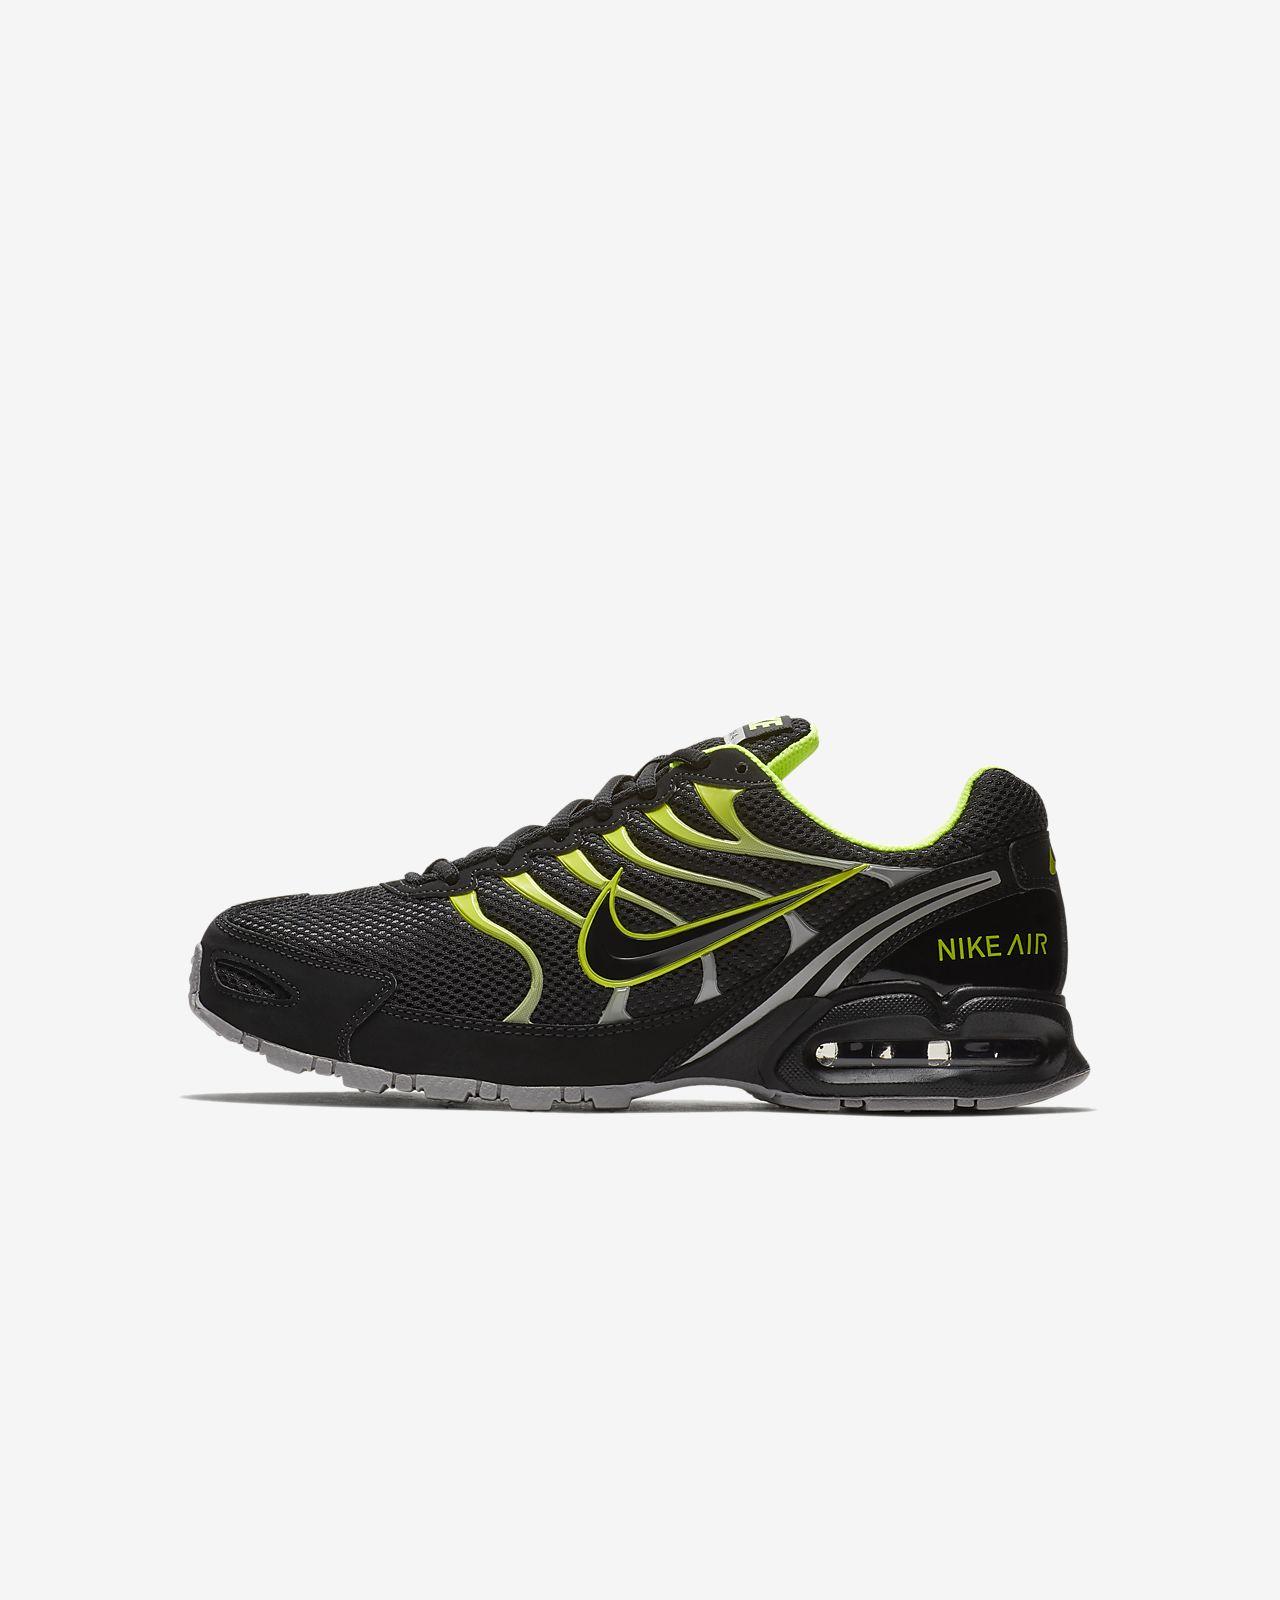 Nike Air Max Torch 4 Herren-Laufschuh